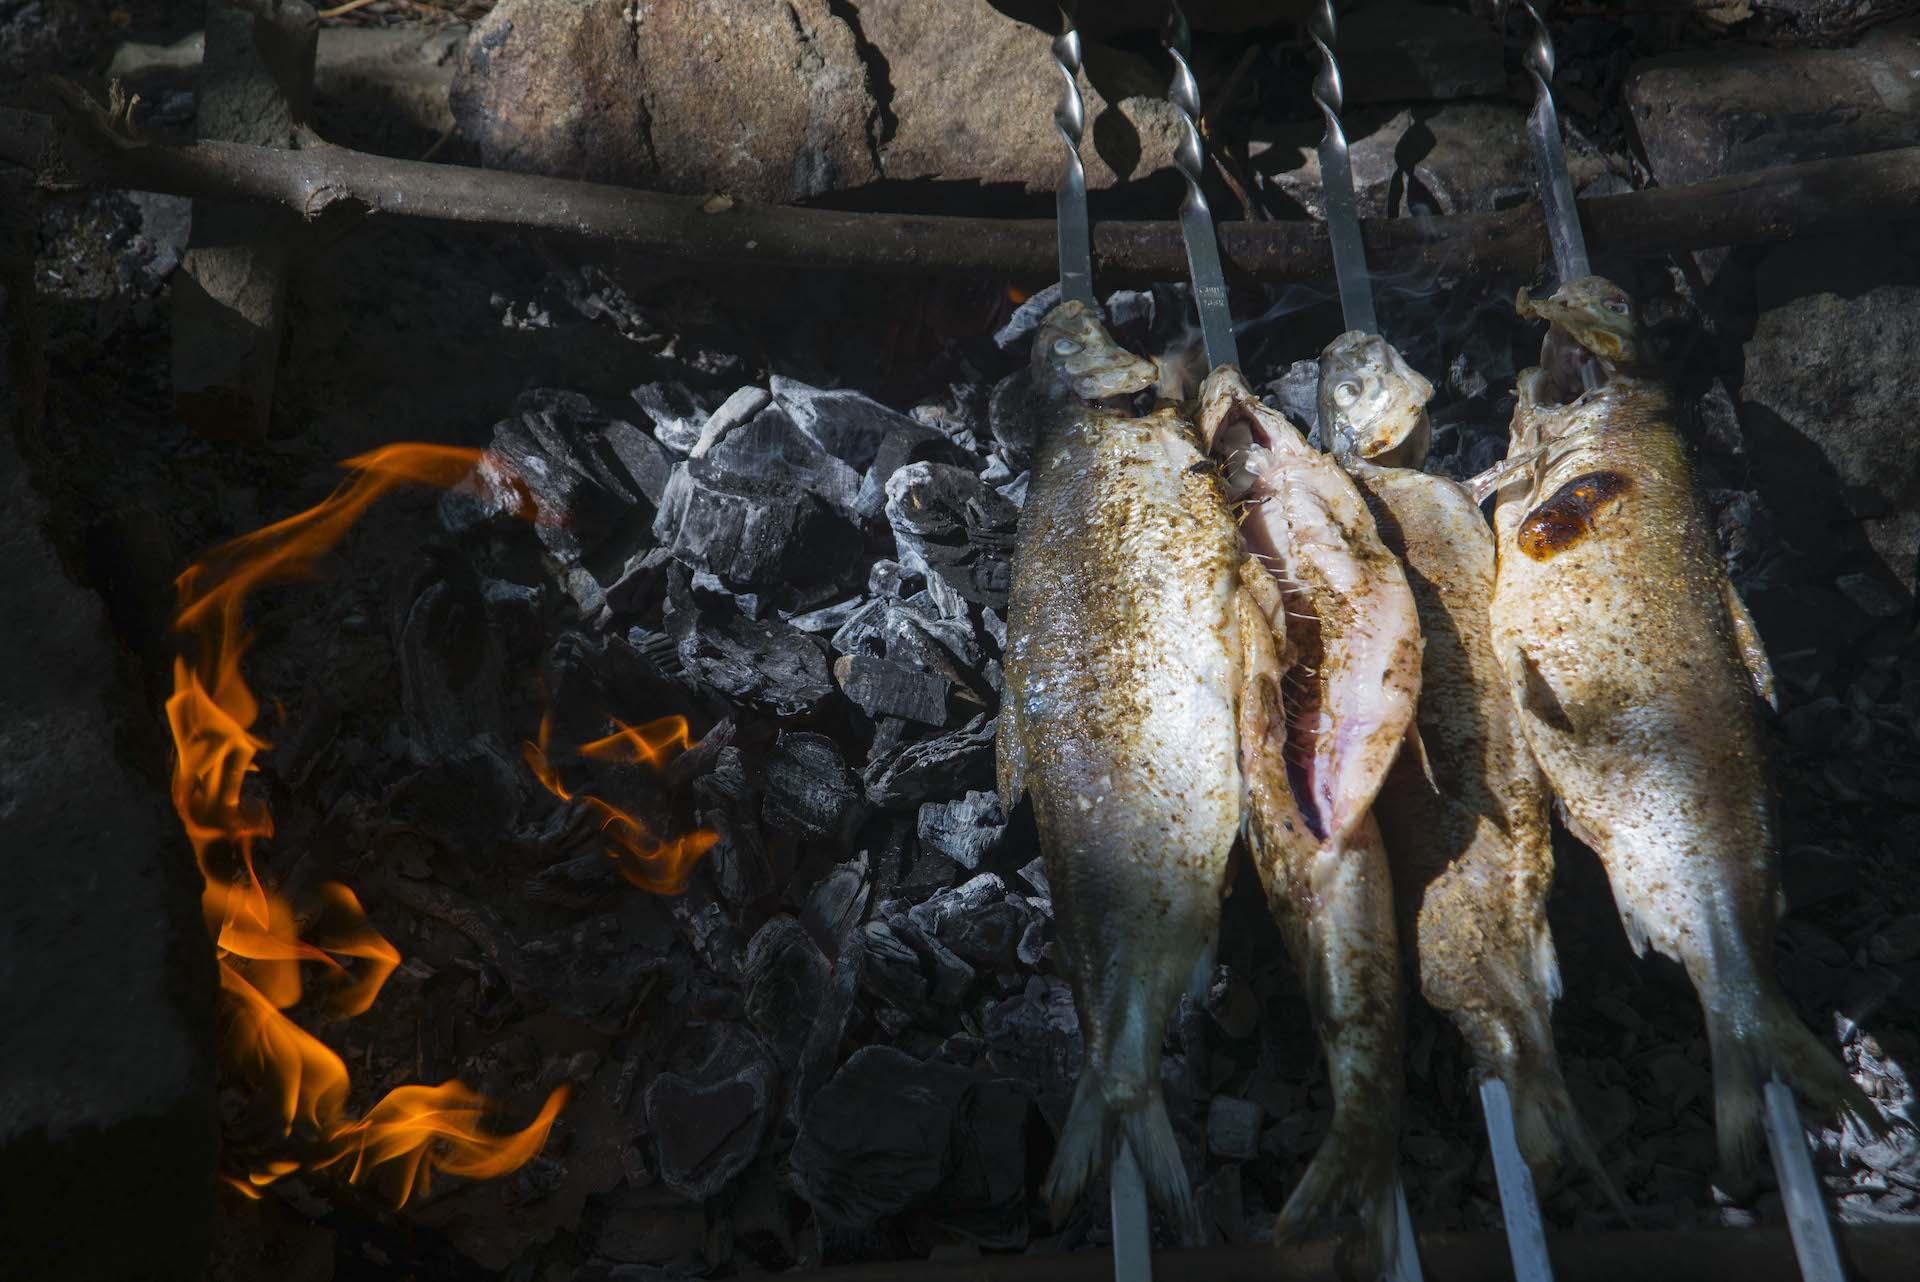 Armenian trout barbeque in Armenia Caucasus.jpg